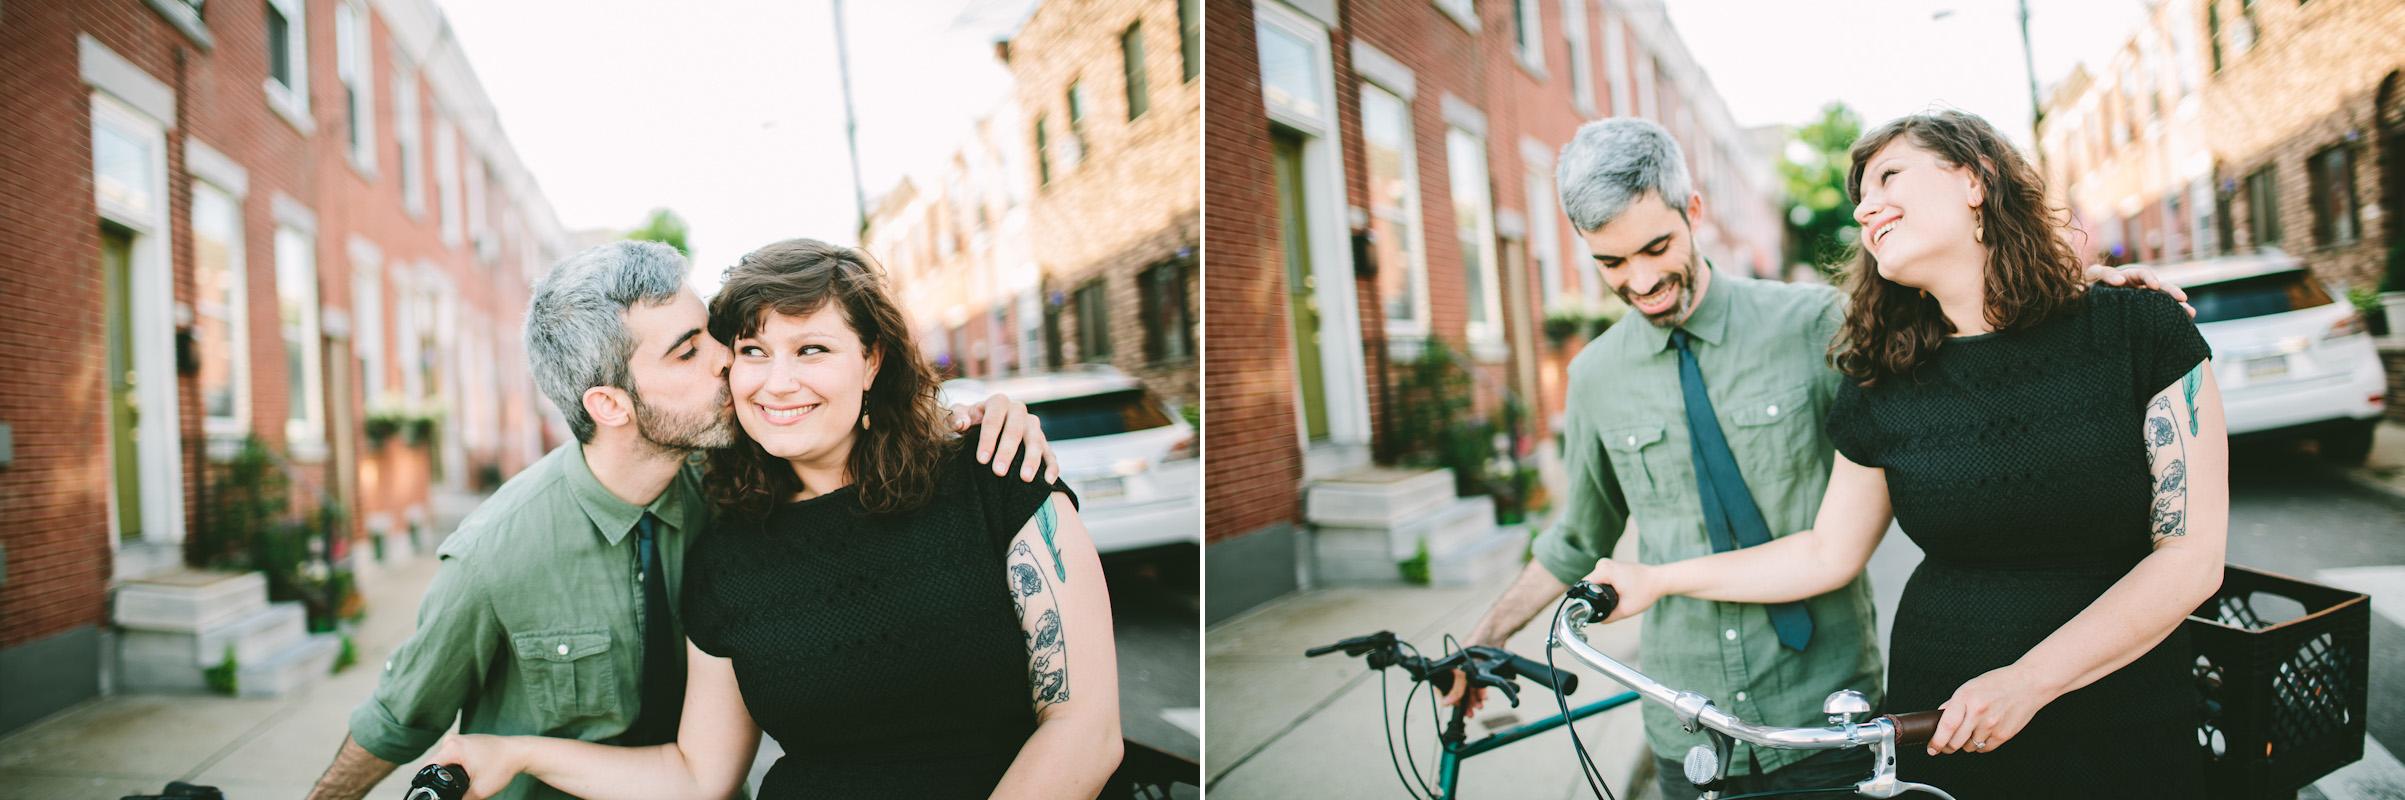 Claire Hudson_Hip Philadelphia Engagement Photography021.jpg